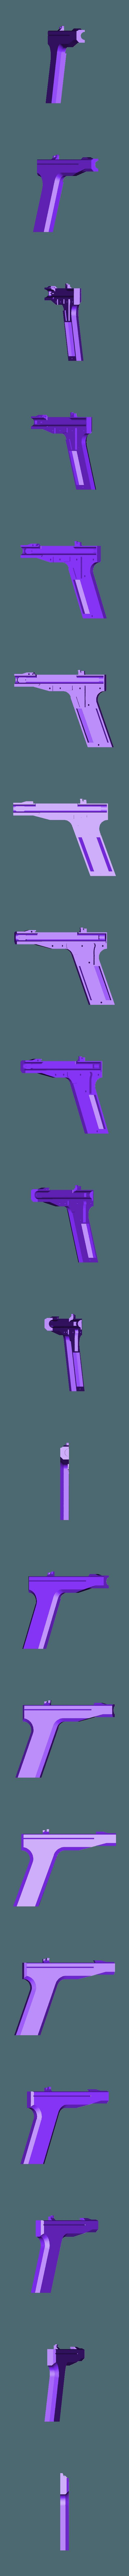 Nerfpistol_body1_v1.2.STL Download STL file Nerf pistol with clip • 3D printer design, MrCrankyface